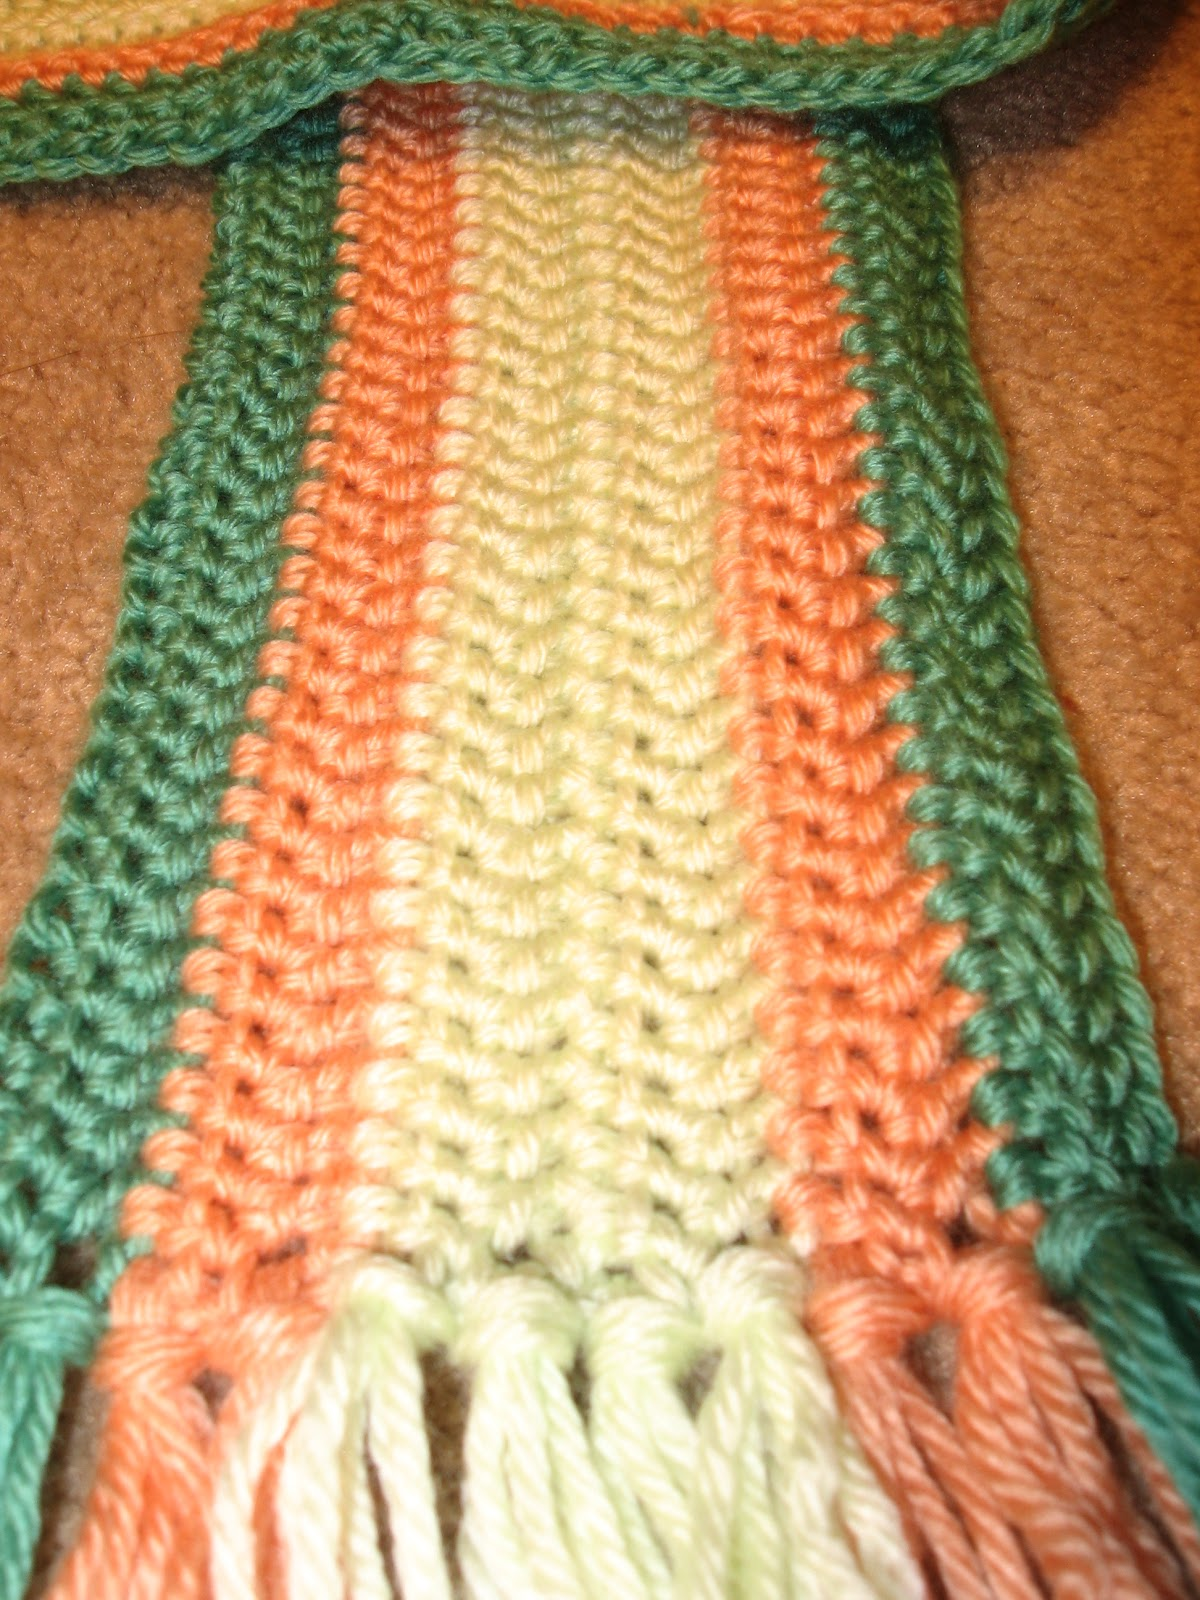 Crochet Scarf Pattern Vertical Stripes : Crafting Adventures: Vertical Stripe Scarf